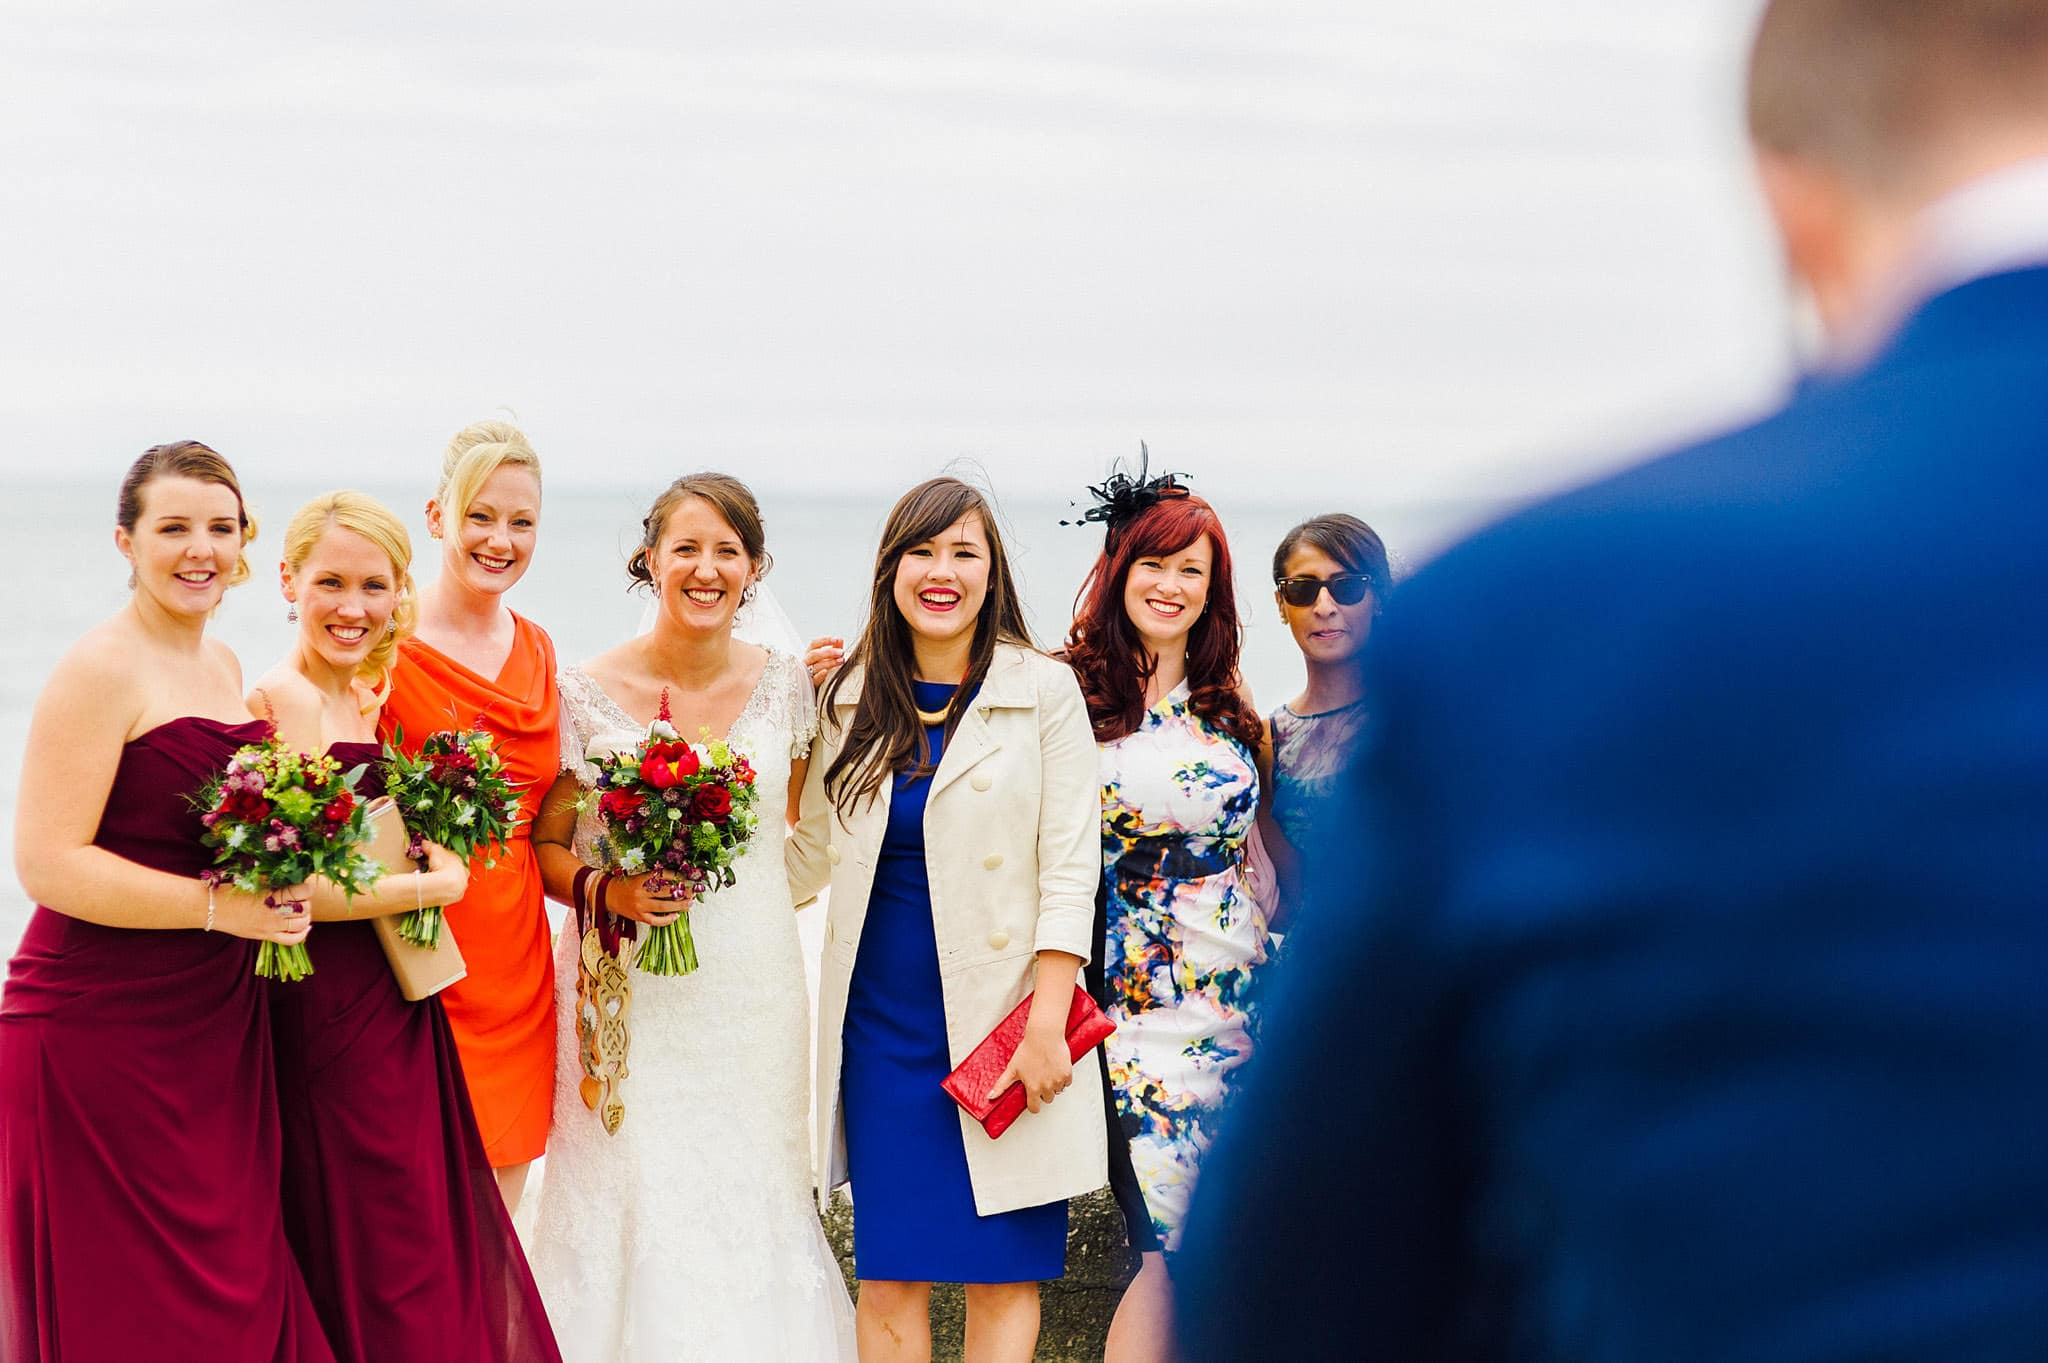 wedding-photographer-aberystwyth-wales (107)